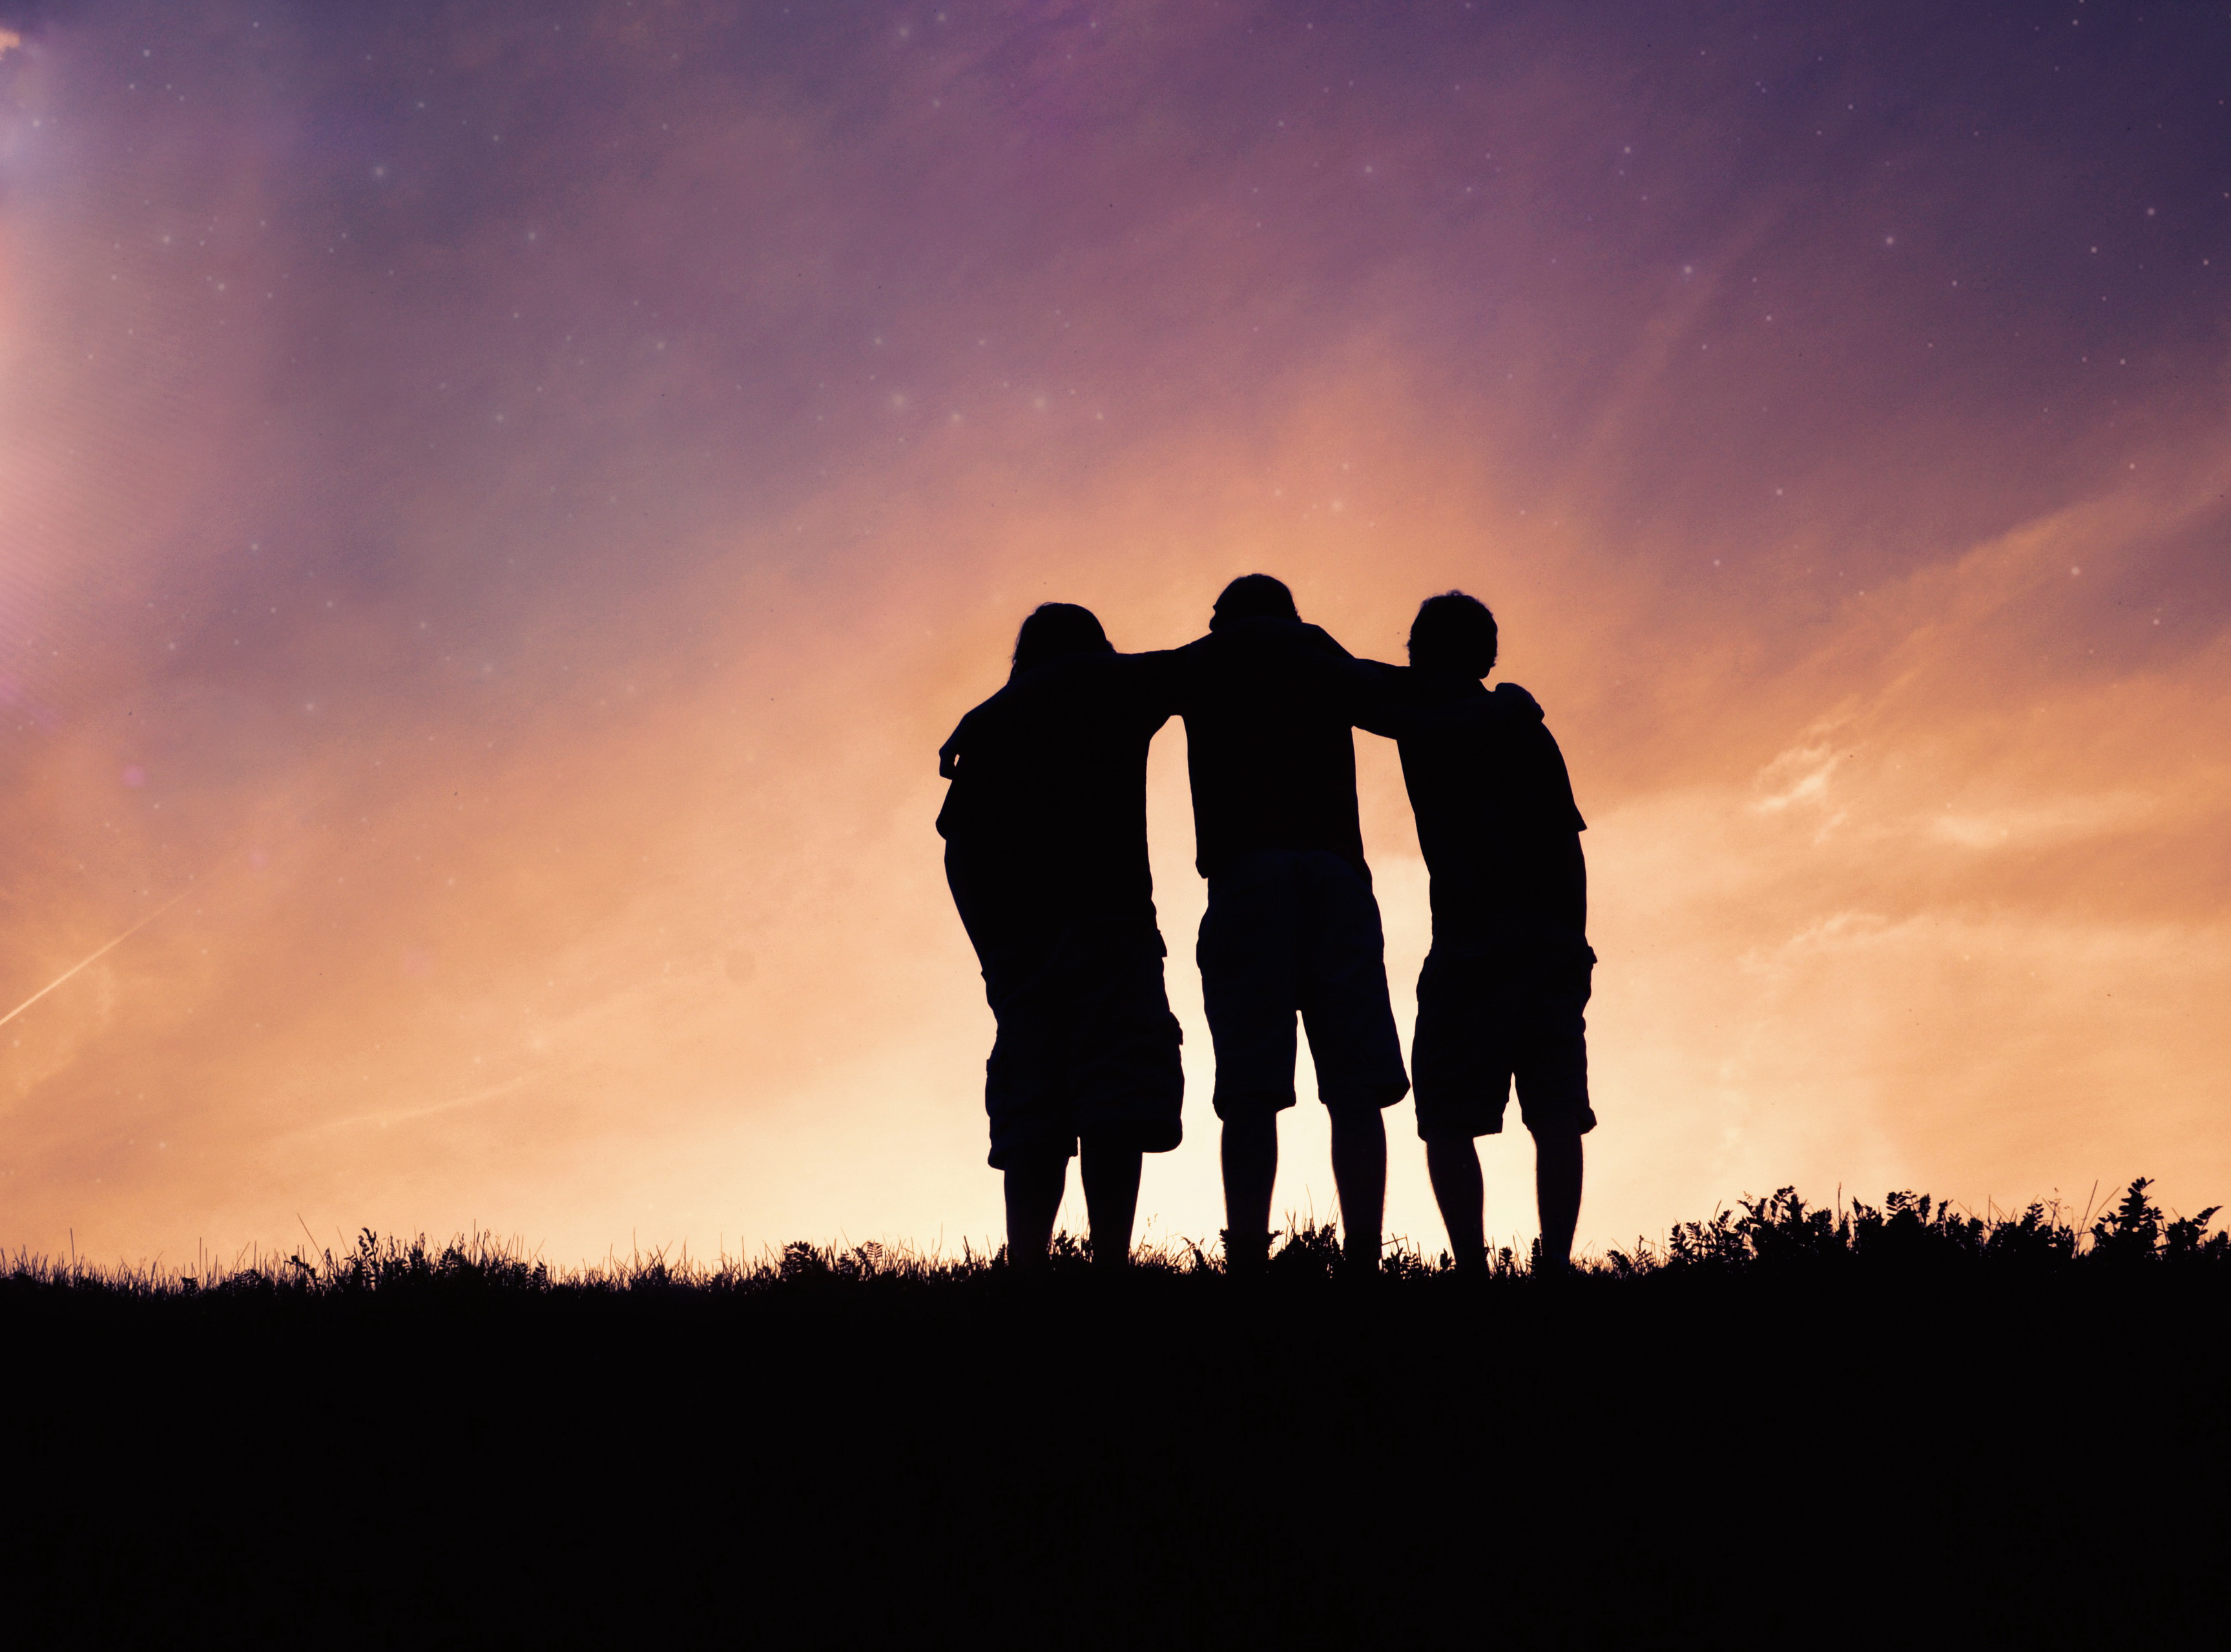 Grup d'ajuda mútua * Grupo de apoyo mutuo